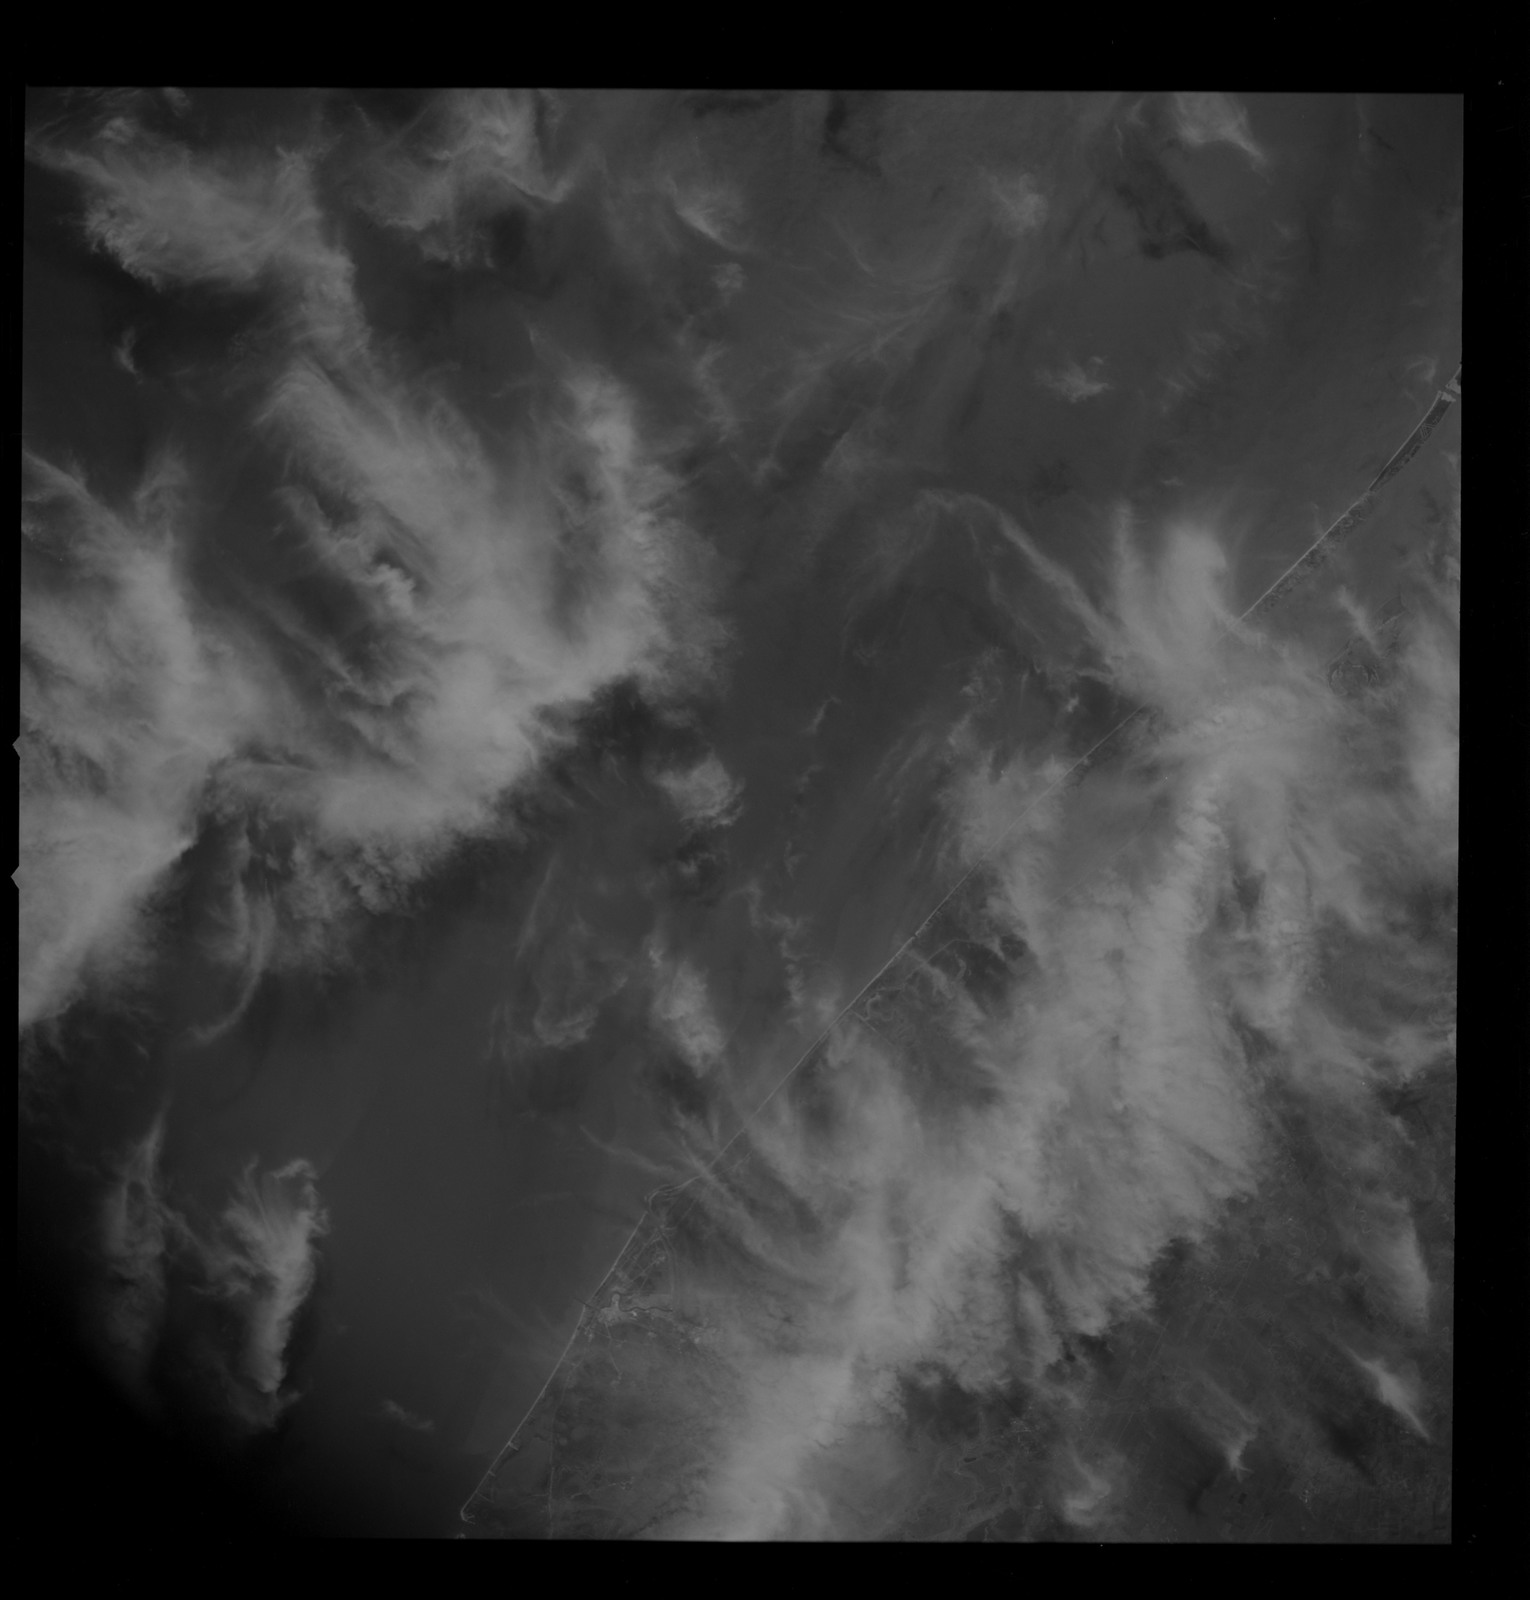 AS09-26B-3759B - Apollo 9 - Apollo 9 Mission image - S0-65 Multispectral Photography - Texas